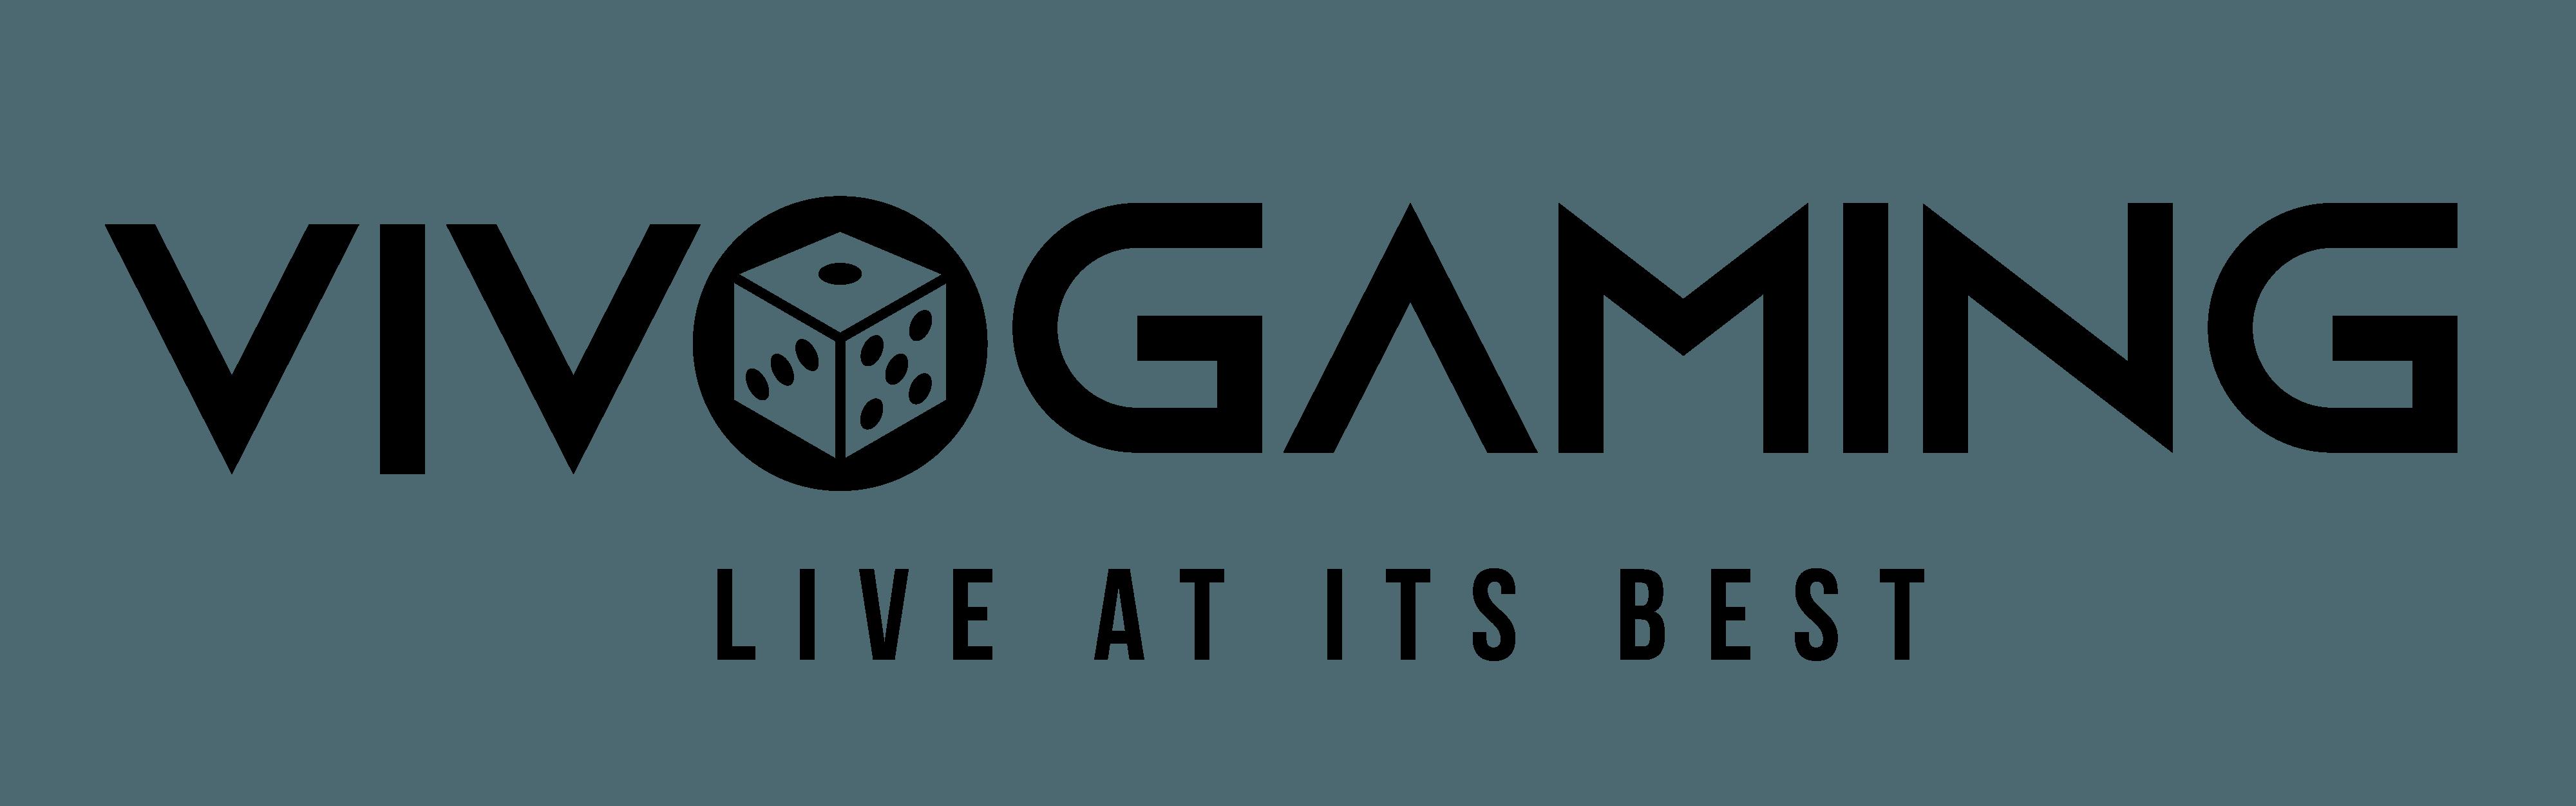 Vivo Gaming jeux